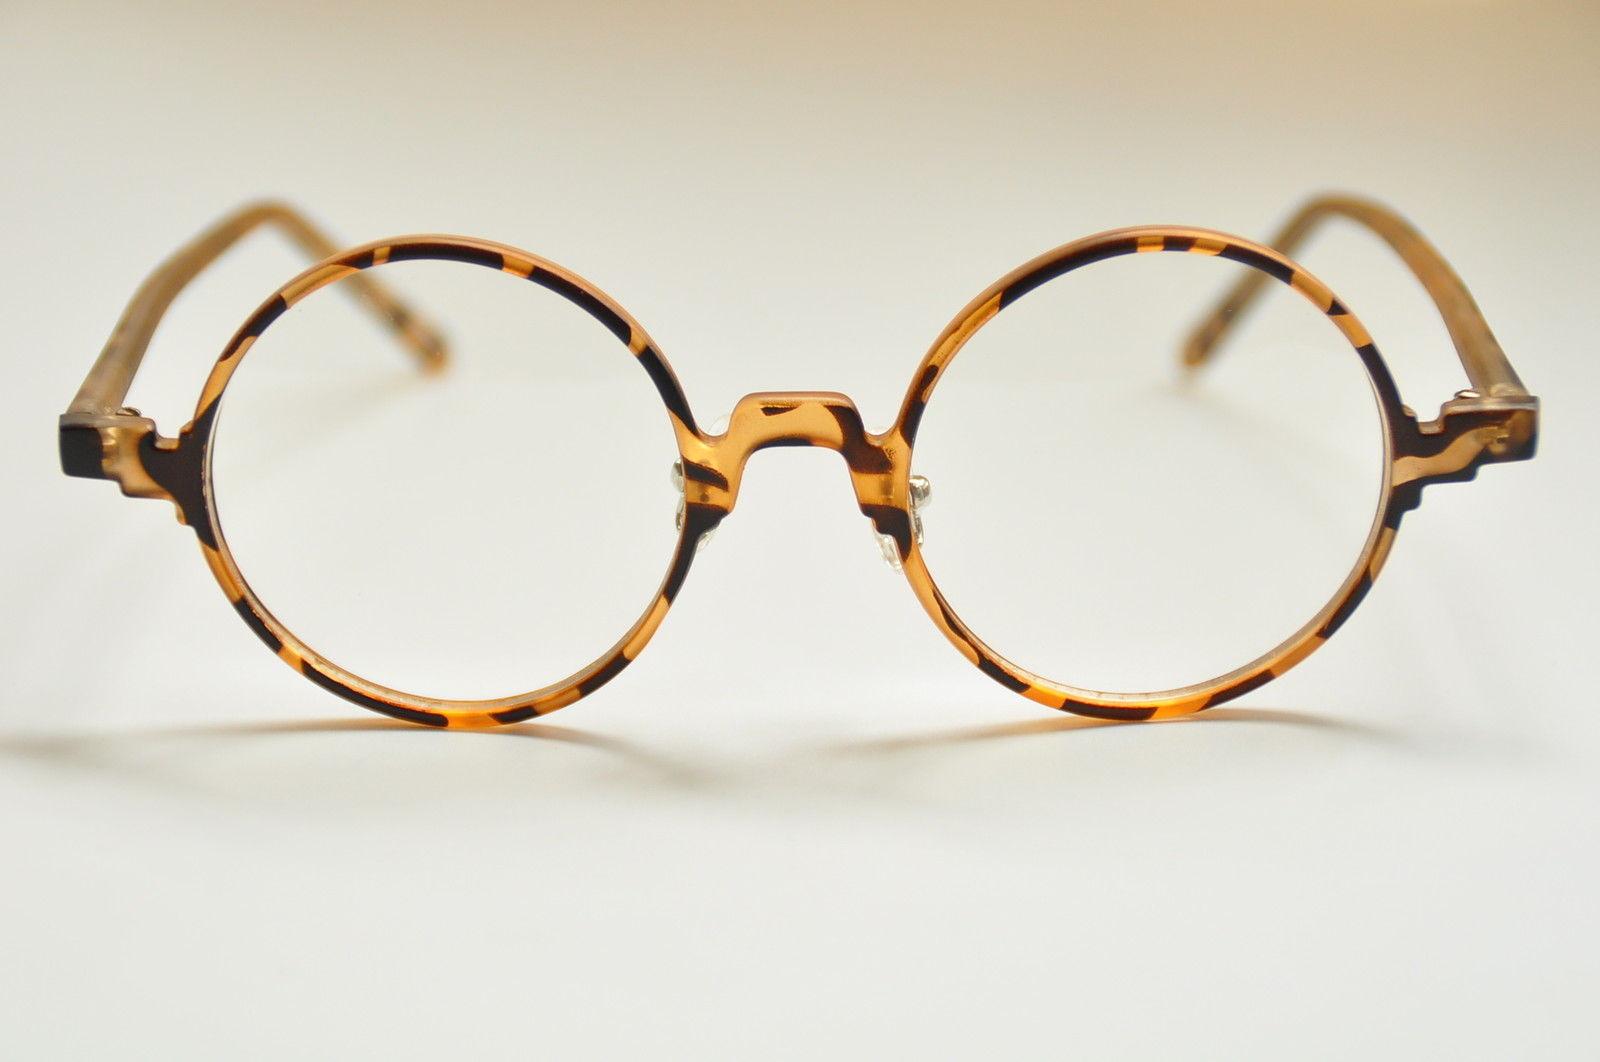 Vintage Tortoise Shell Eyeglass Frames : Vintage Round Eyeglass Frames Retro Spectacles Eyewear RX ...